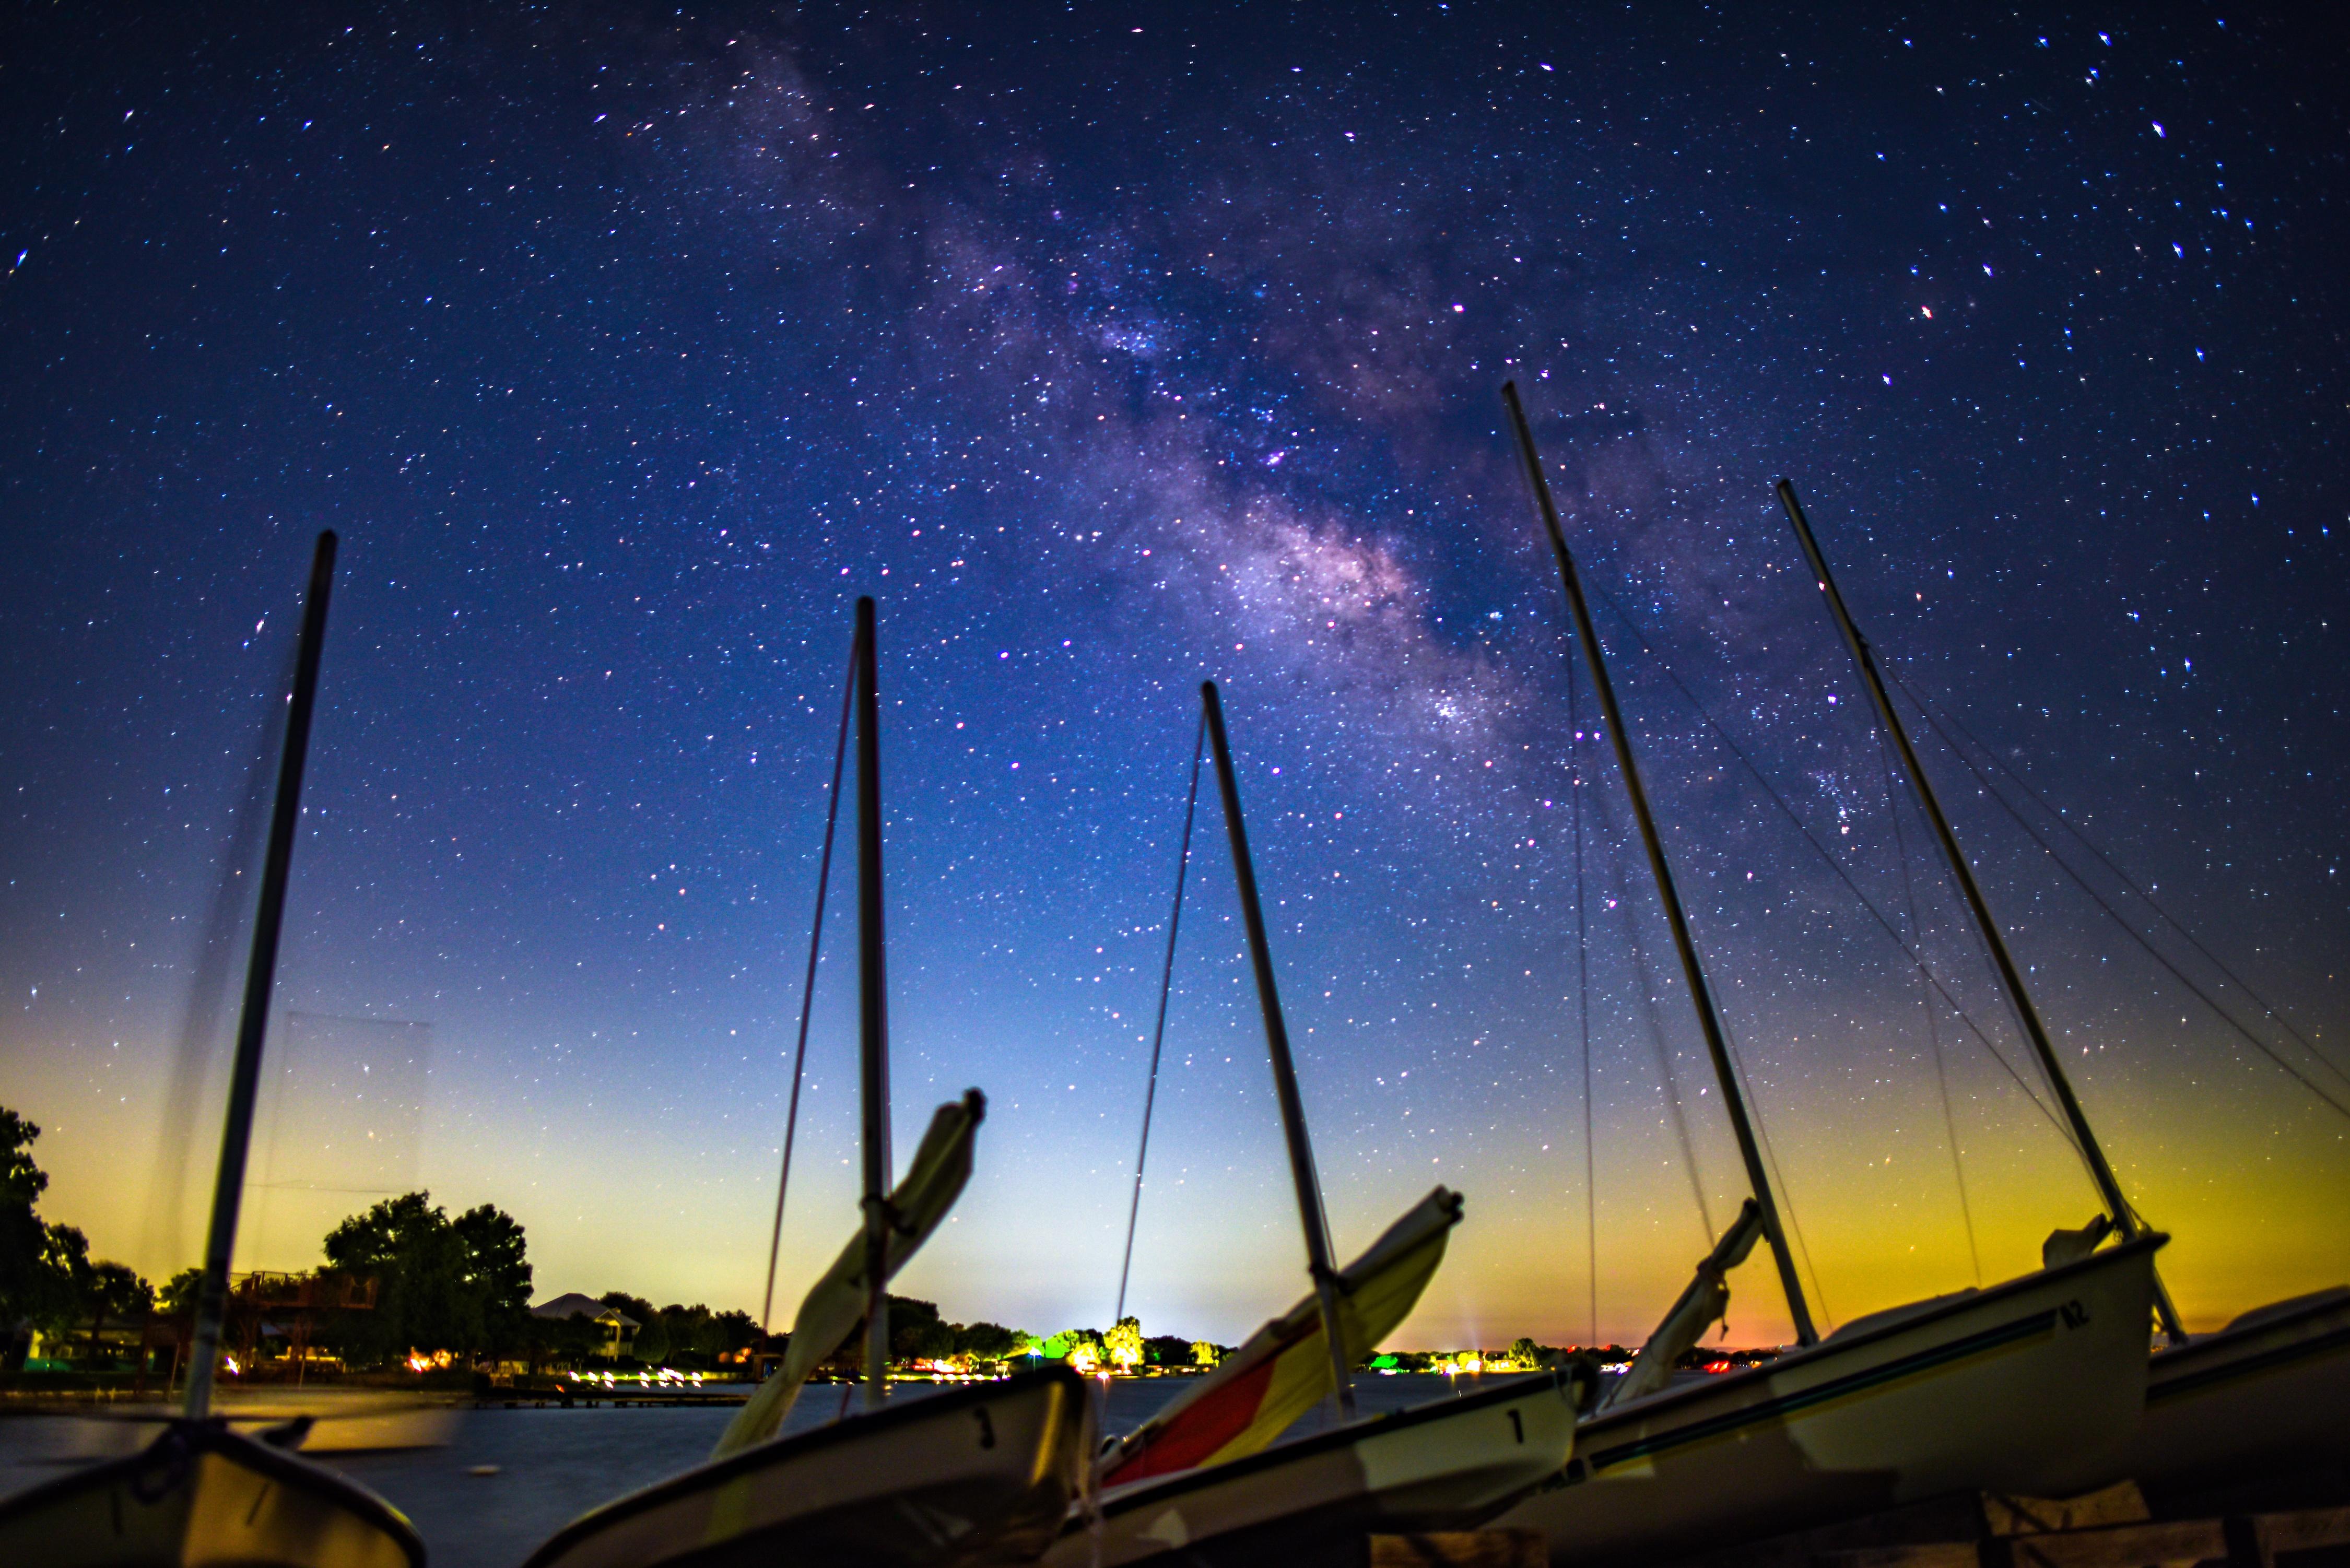 Goodgame Sailboats Milky Way.jpg